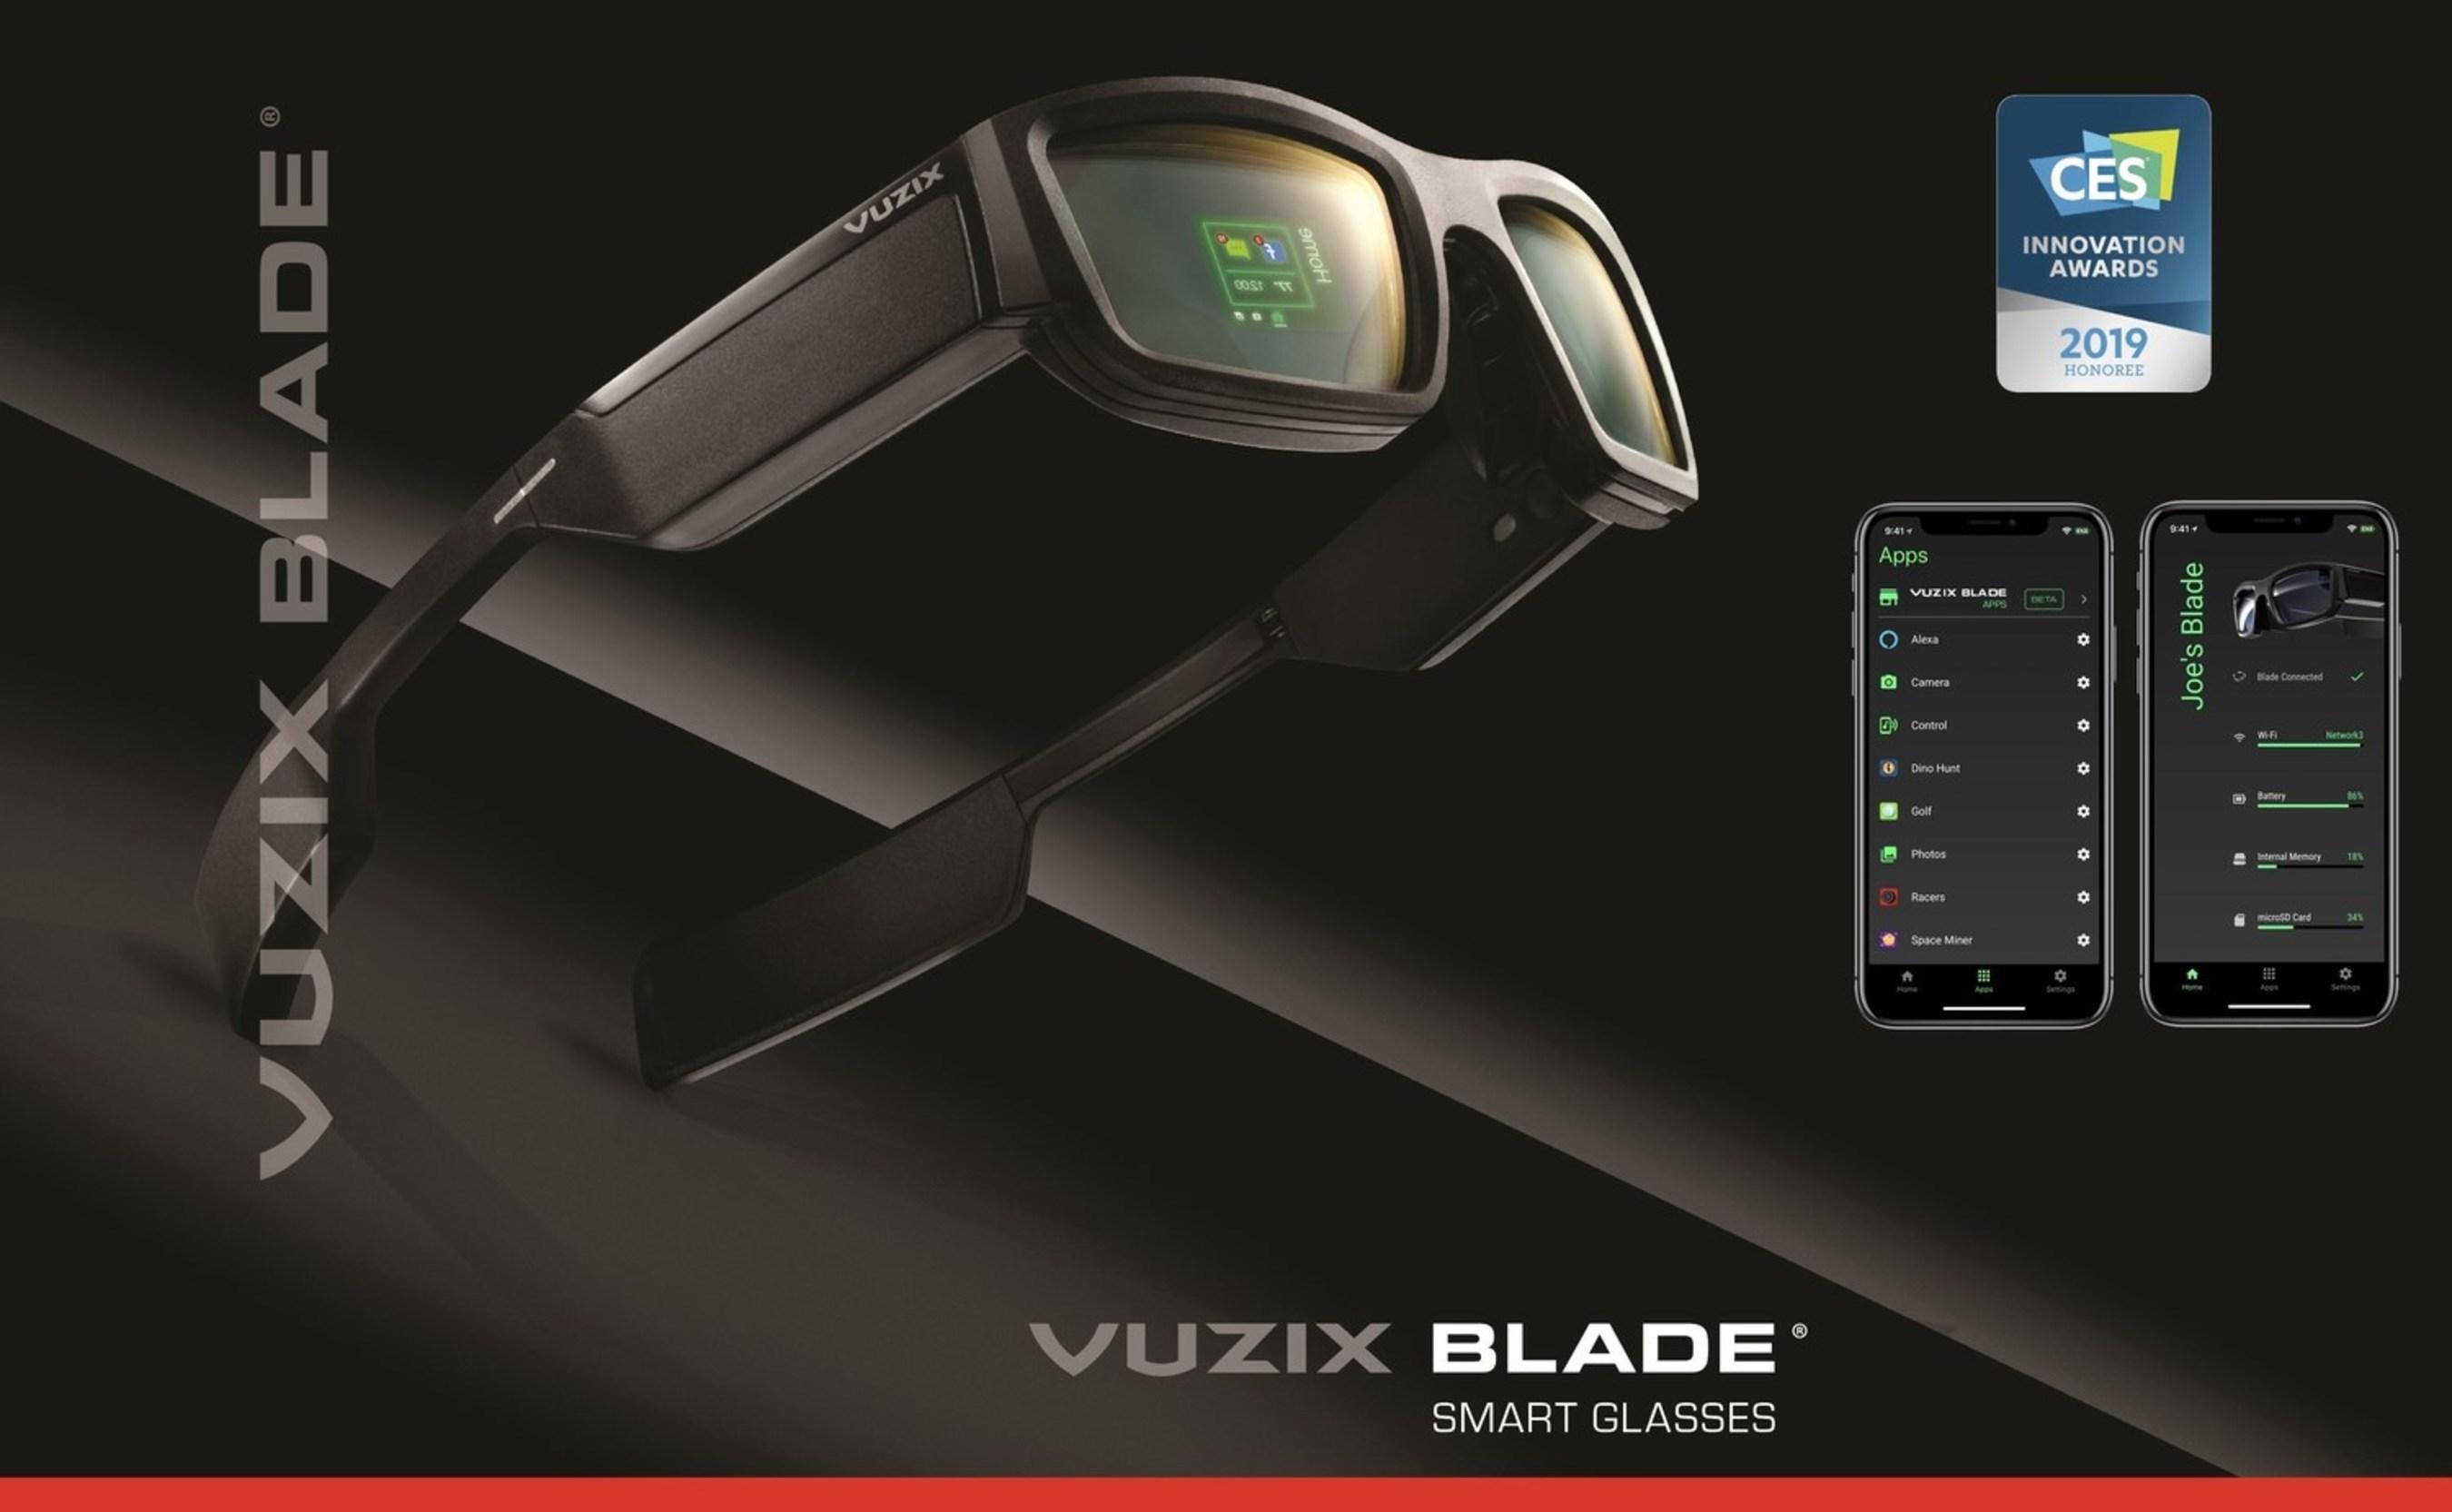 Vuzix Blade Wins 2019 Innovation Award (PRNewsfoto/Vuzix Corporation)